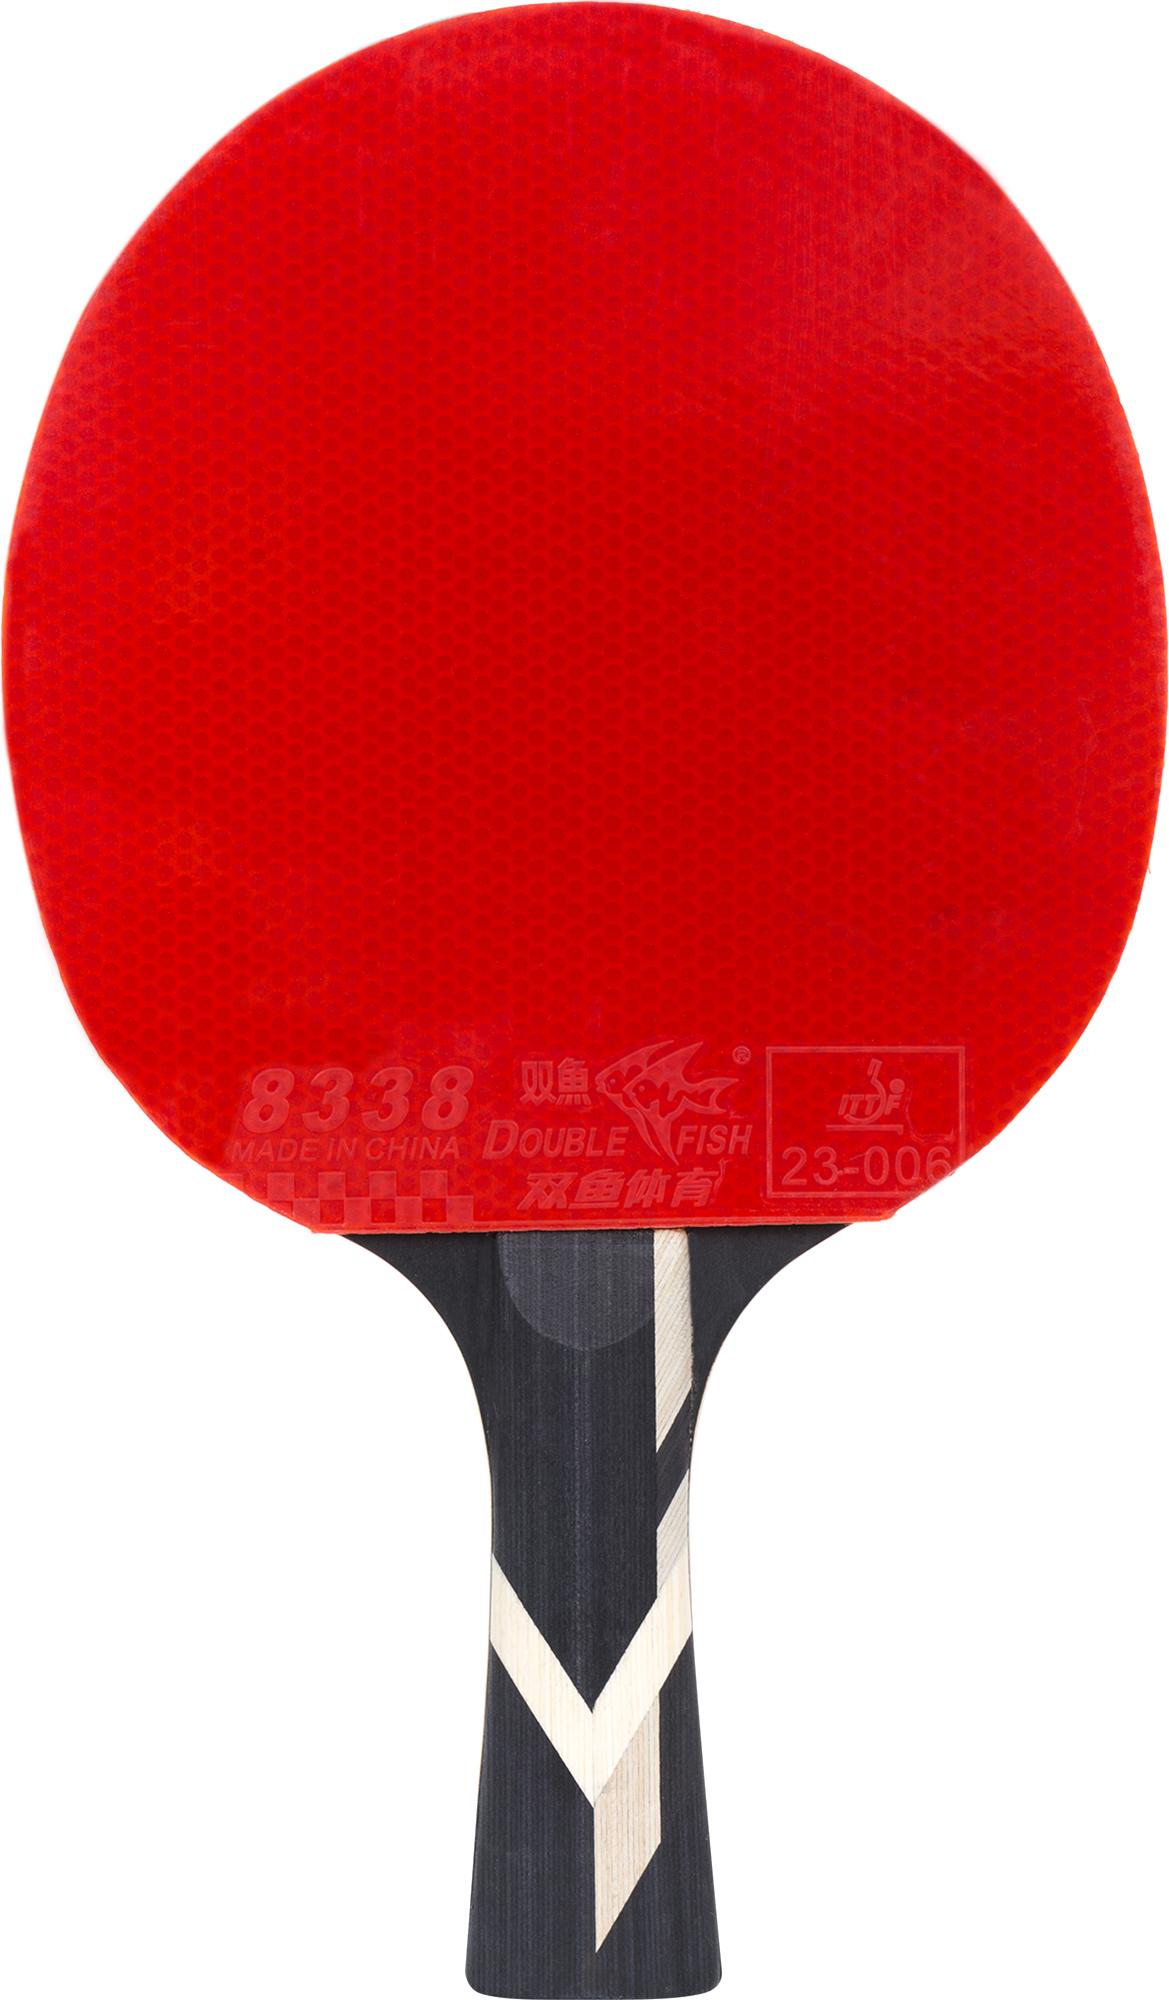 Torneo Ракетка для настольного тенниса Torneo Champion torneo ракетка для настольного тенниса torneo training